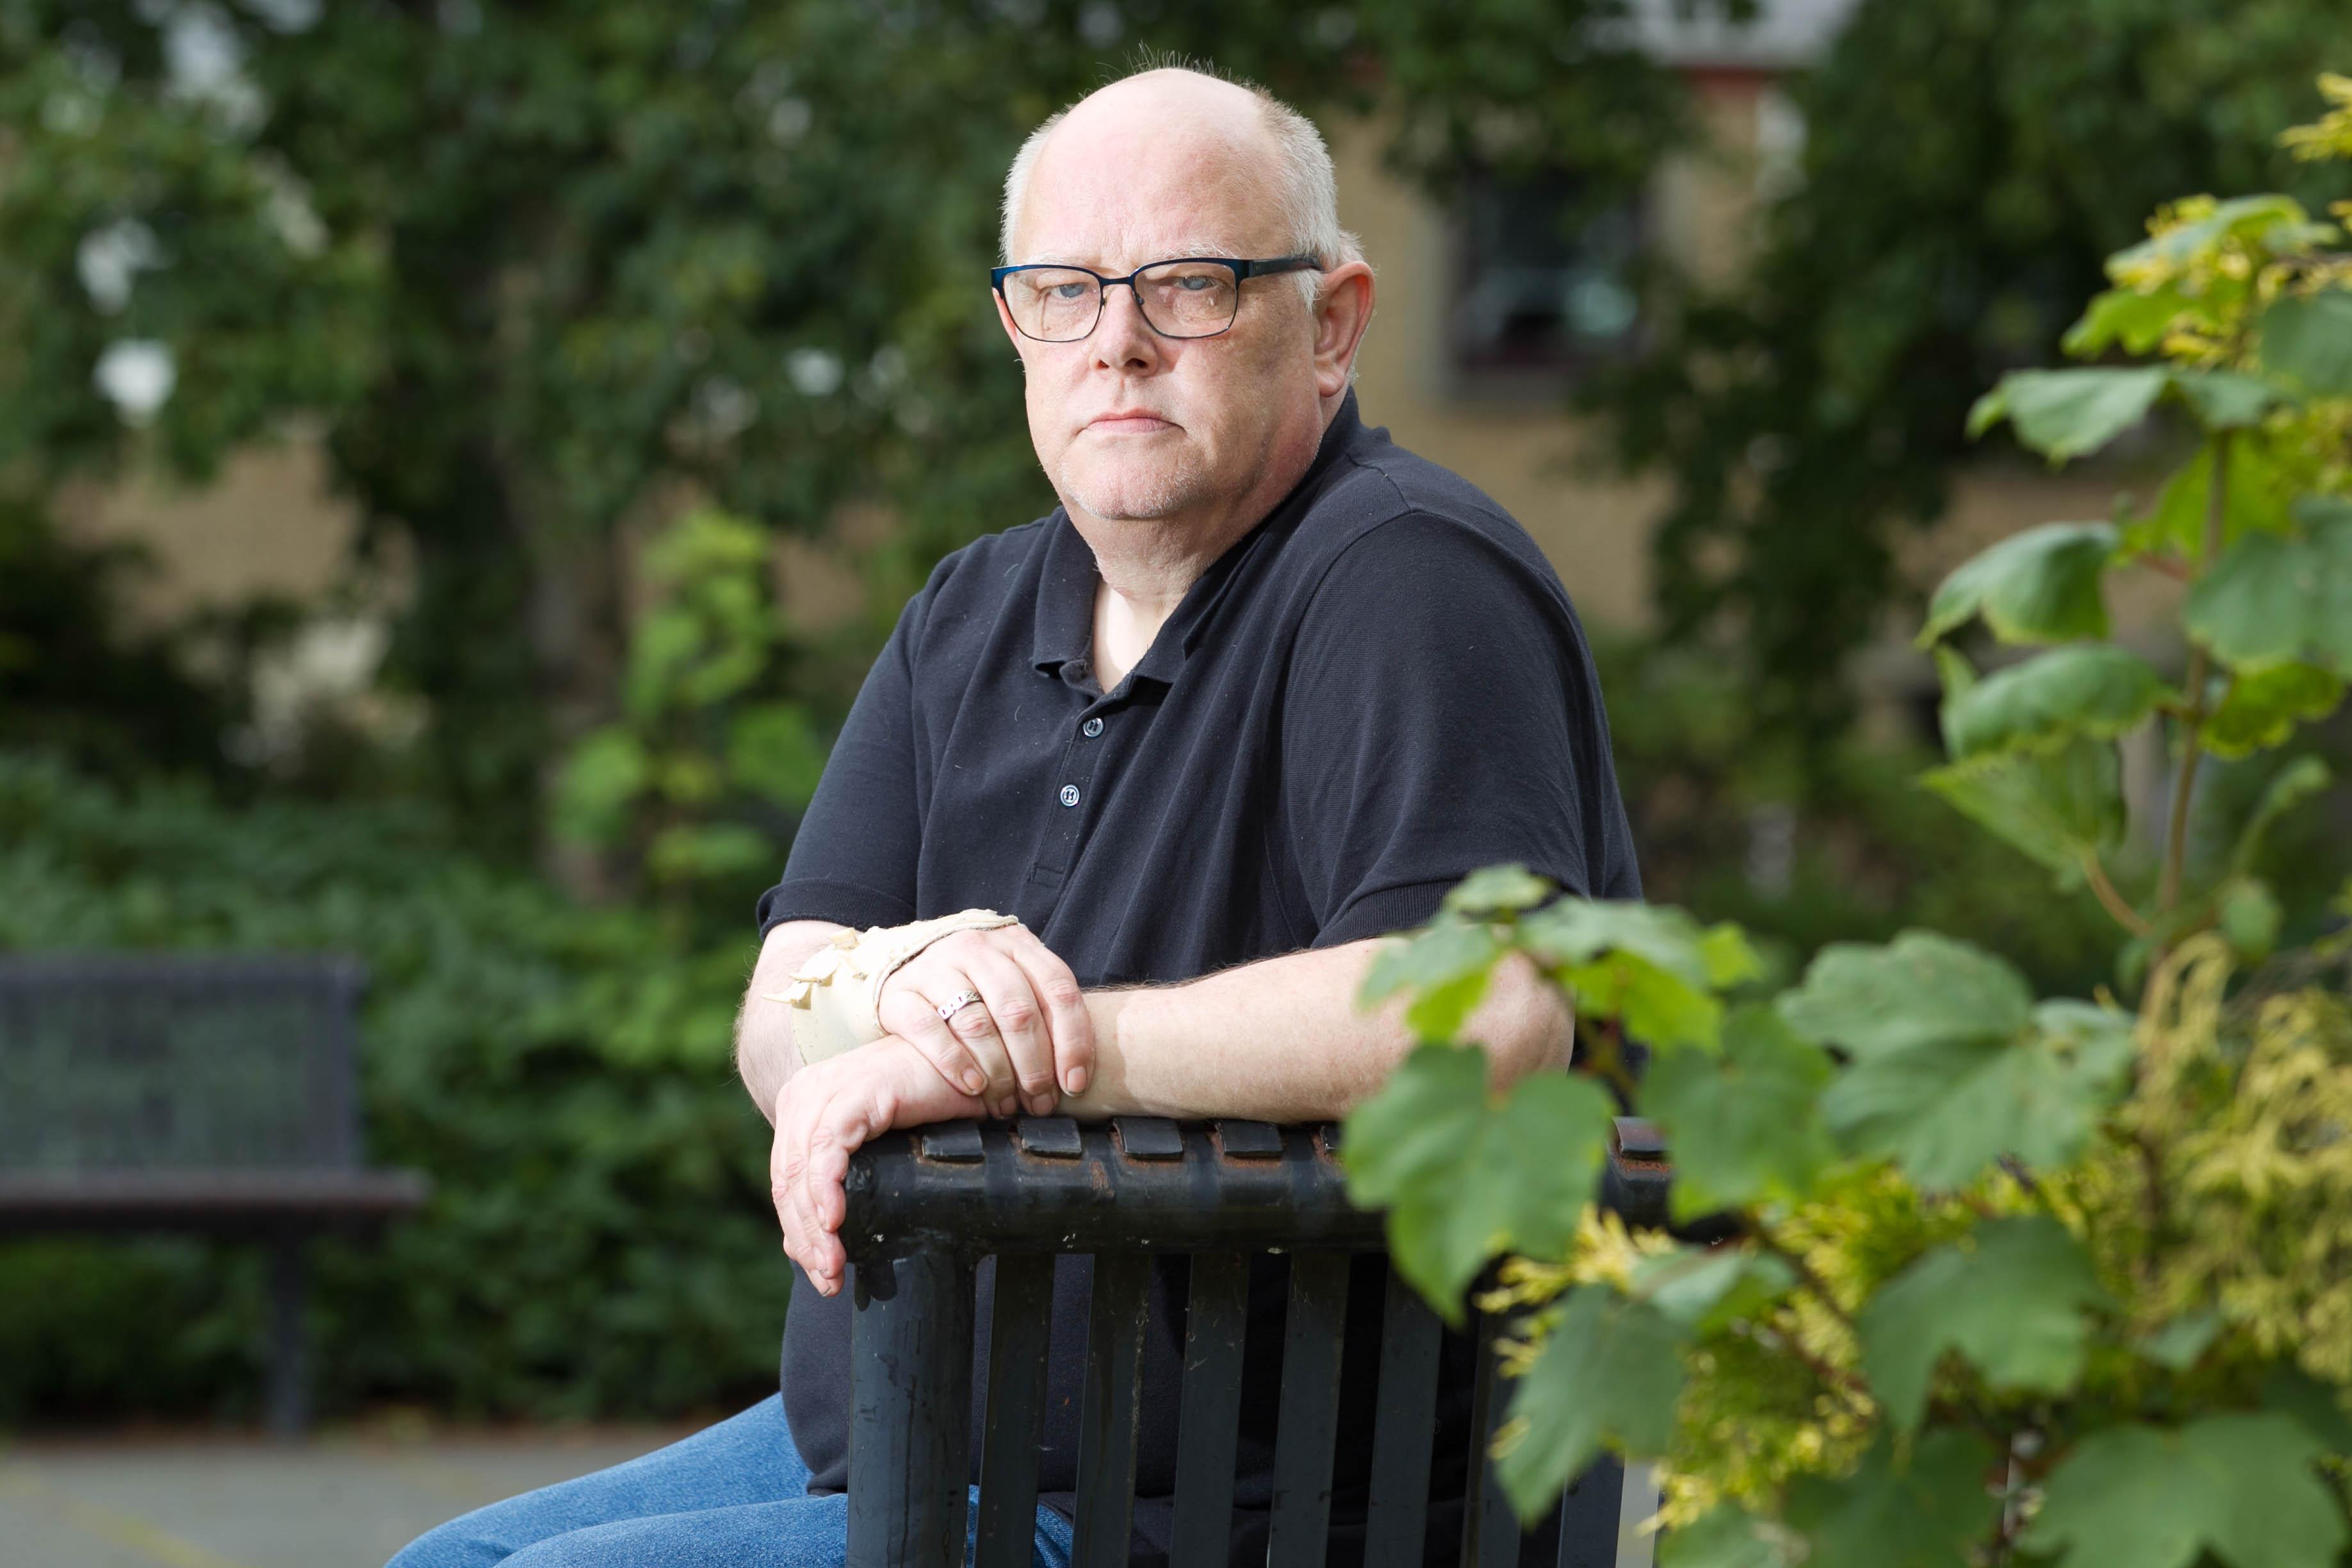 Gordon Yuill, whose son John was killed in the crash